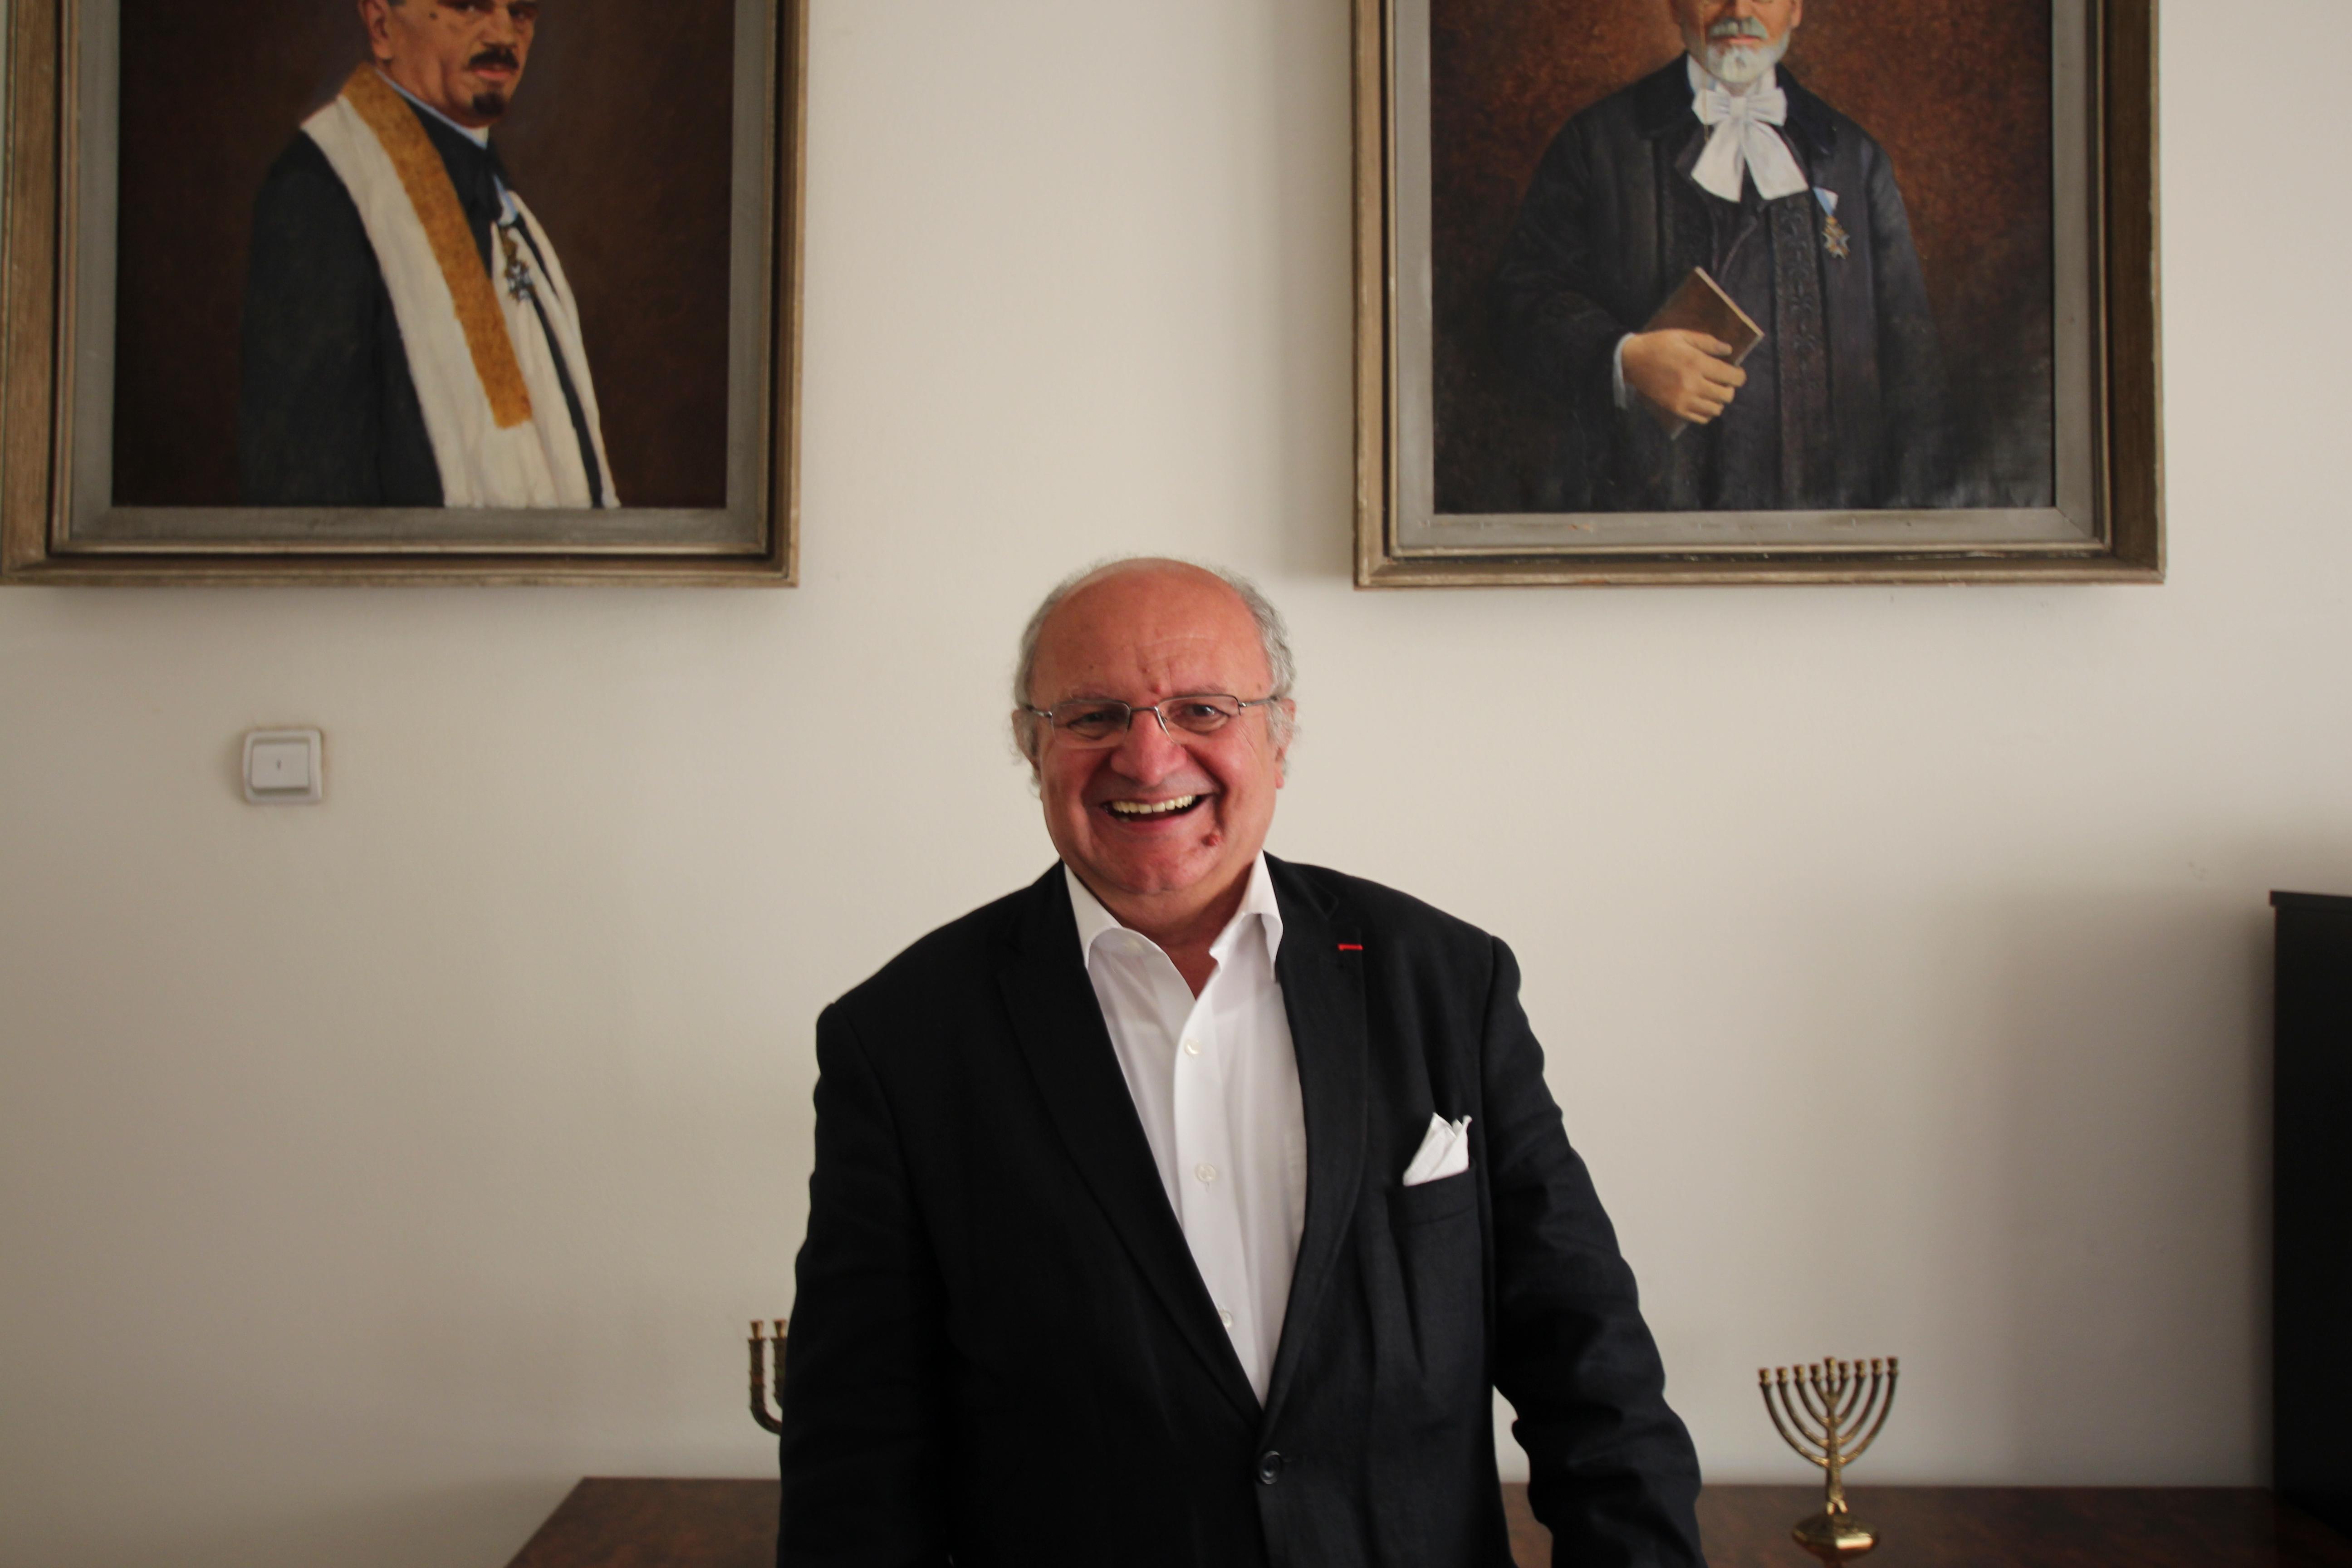 Jakob Finci in the premises of the Jewish community in Sarajevo (photo by Andrea Rossini)